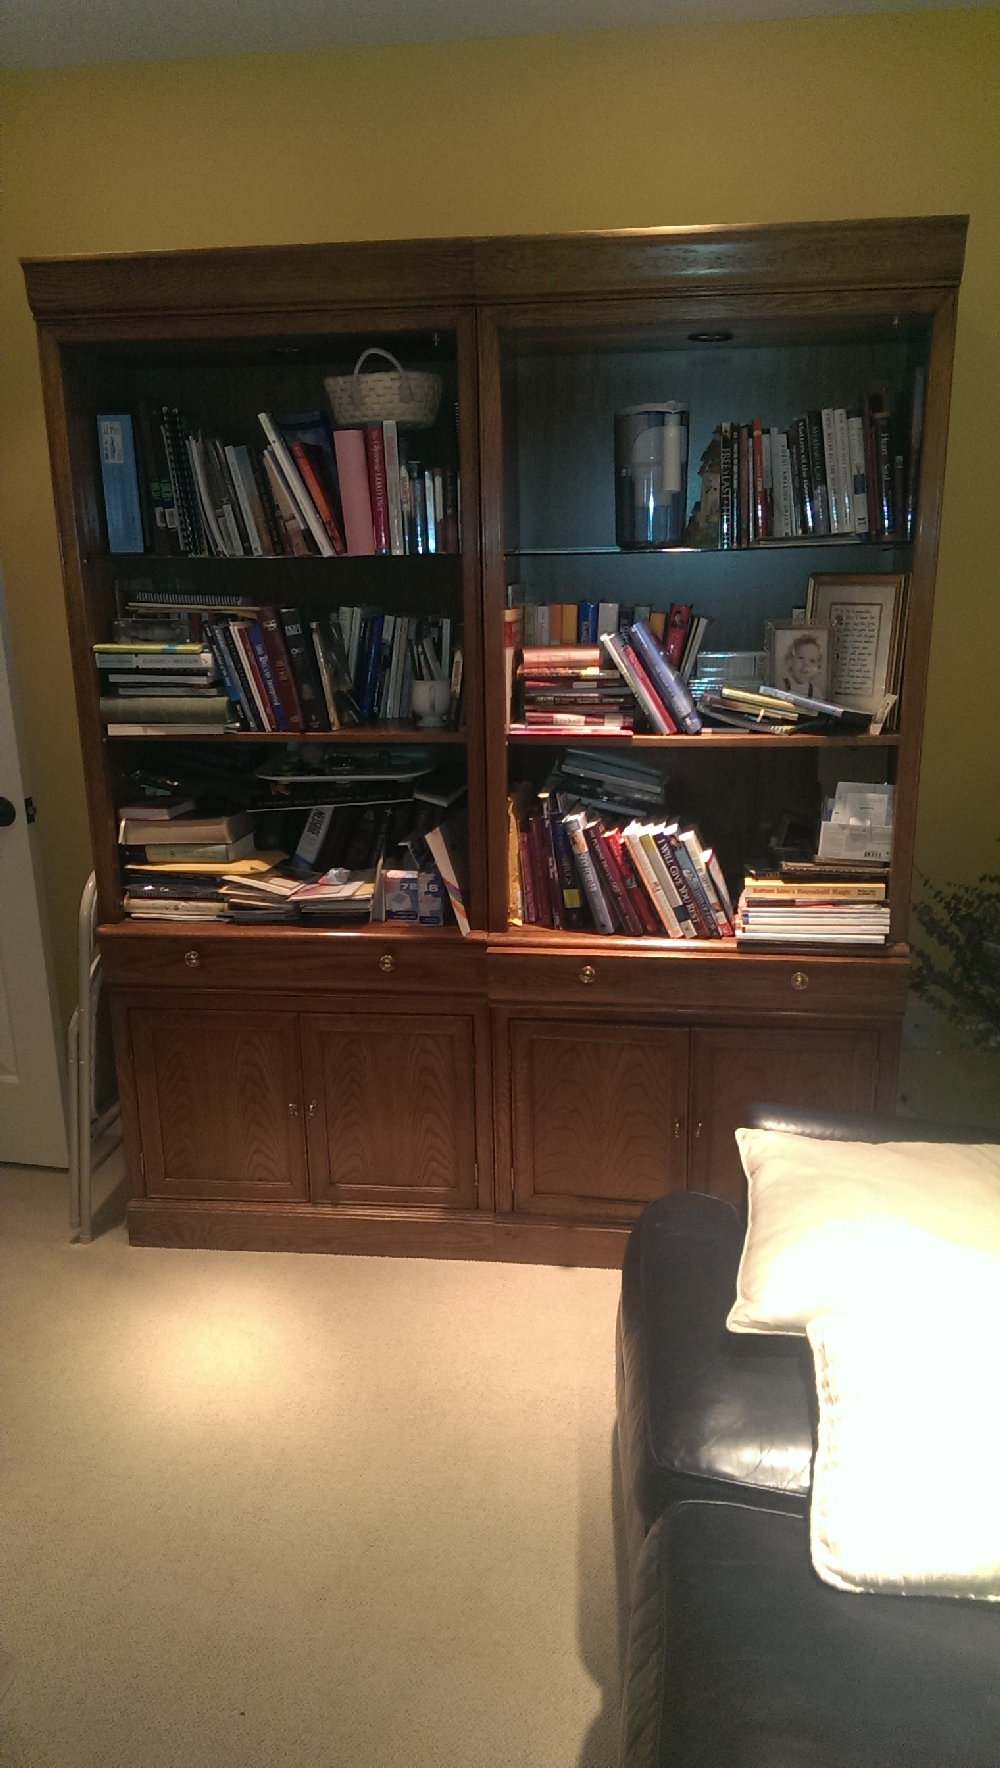 Office - book shelves in office